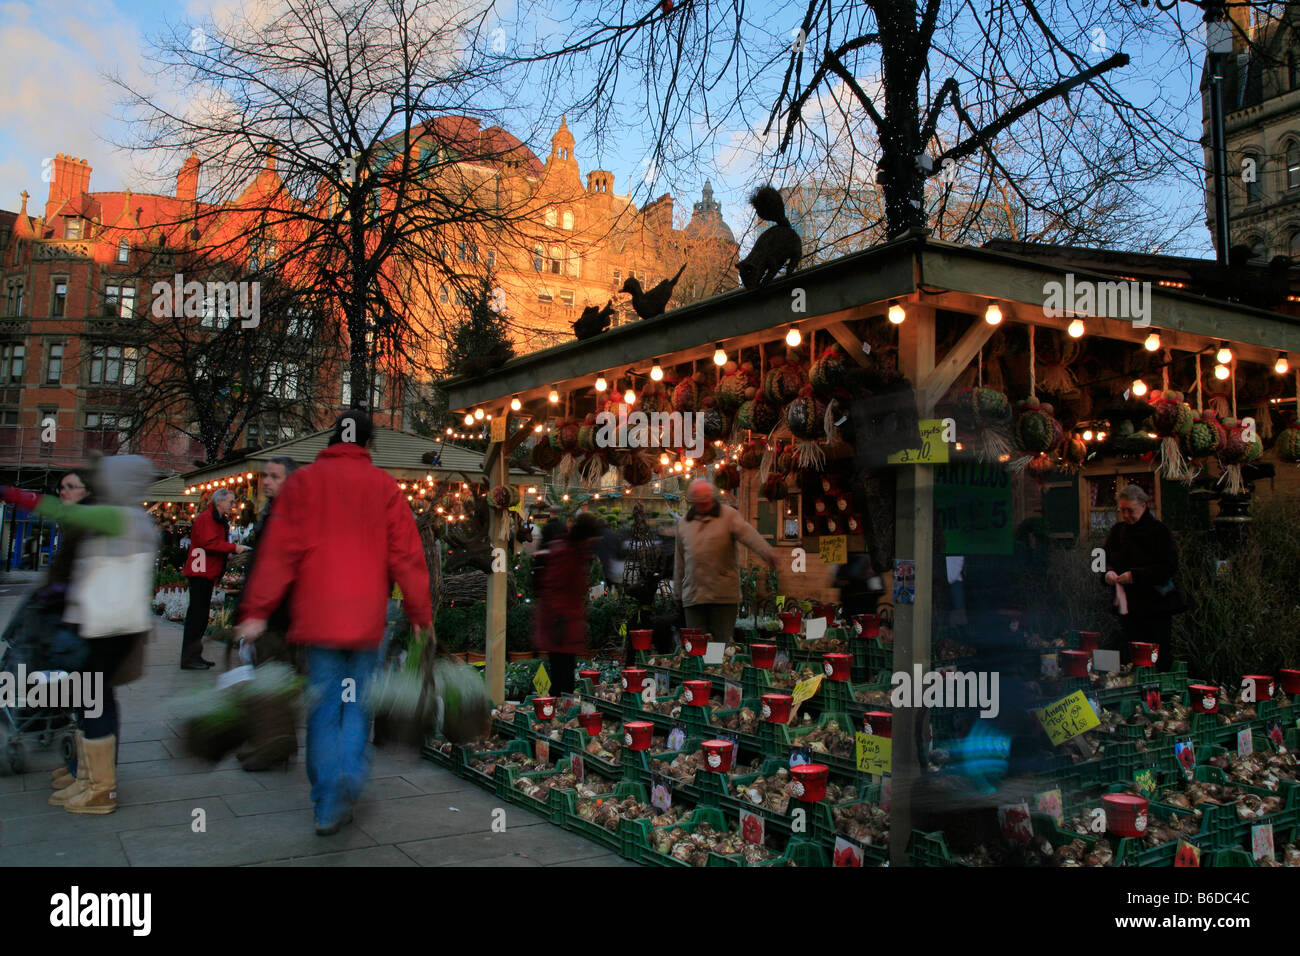 sunset over st alberts square christmas market stock image - Christmas Market Dc